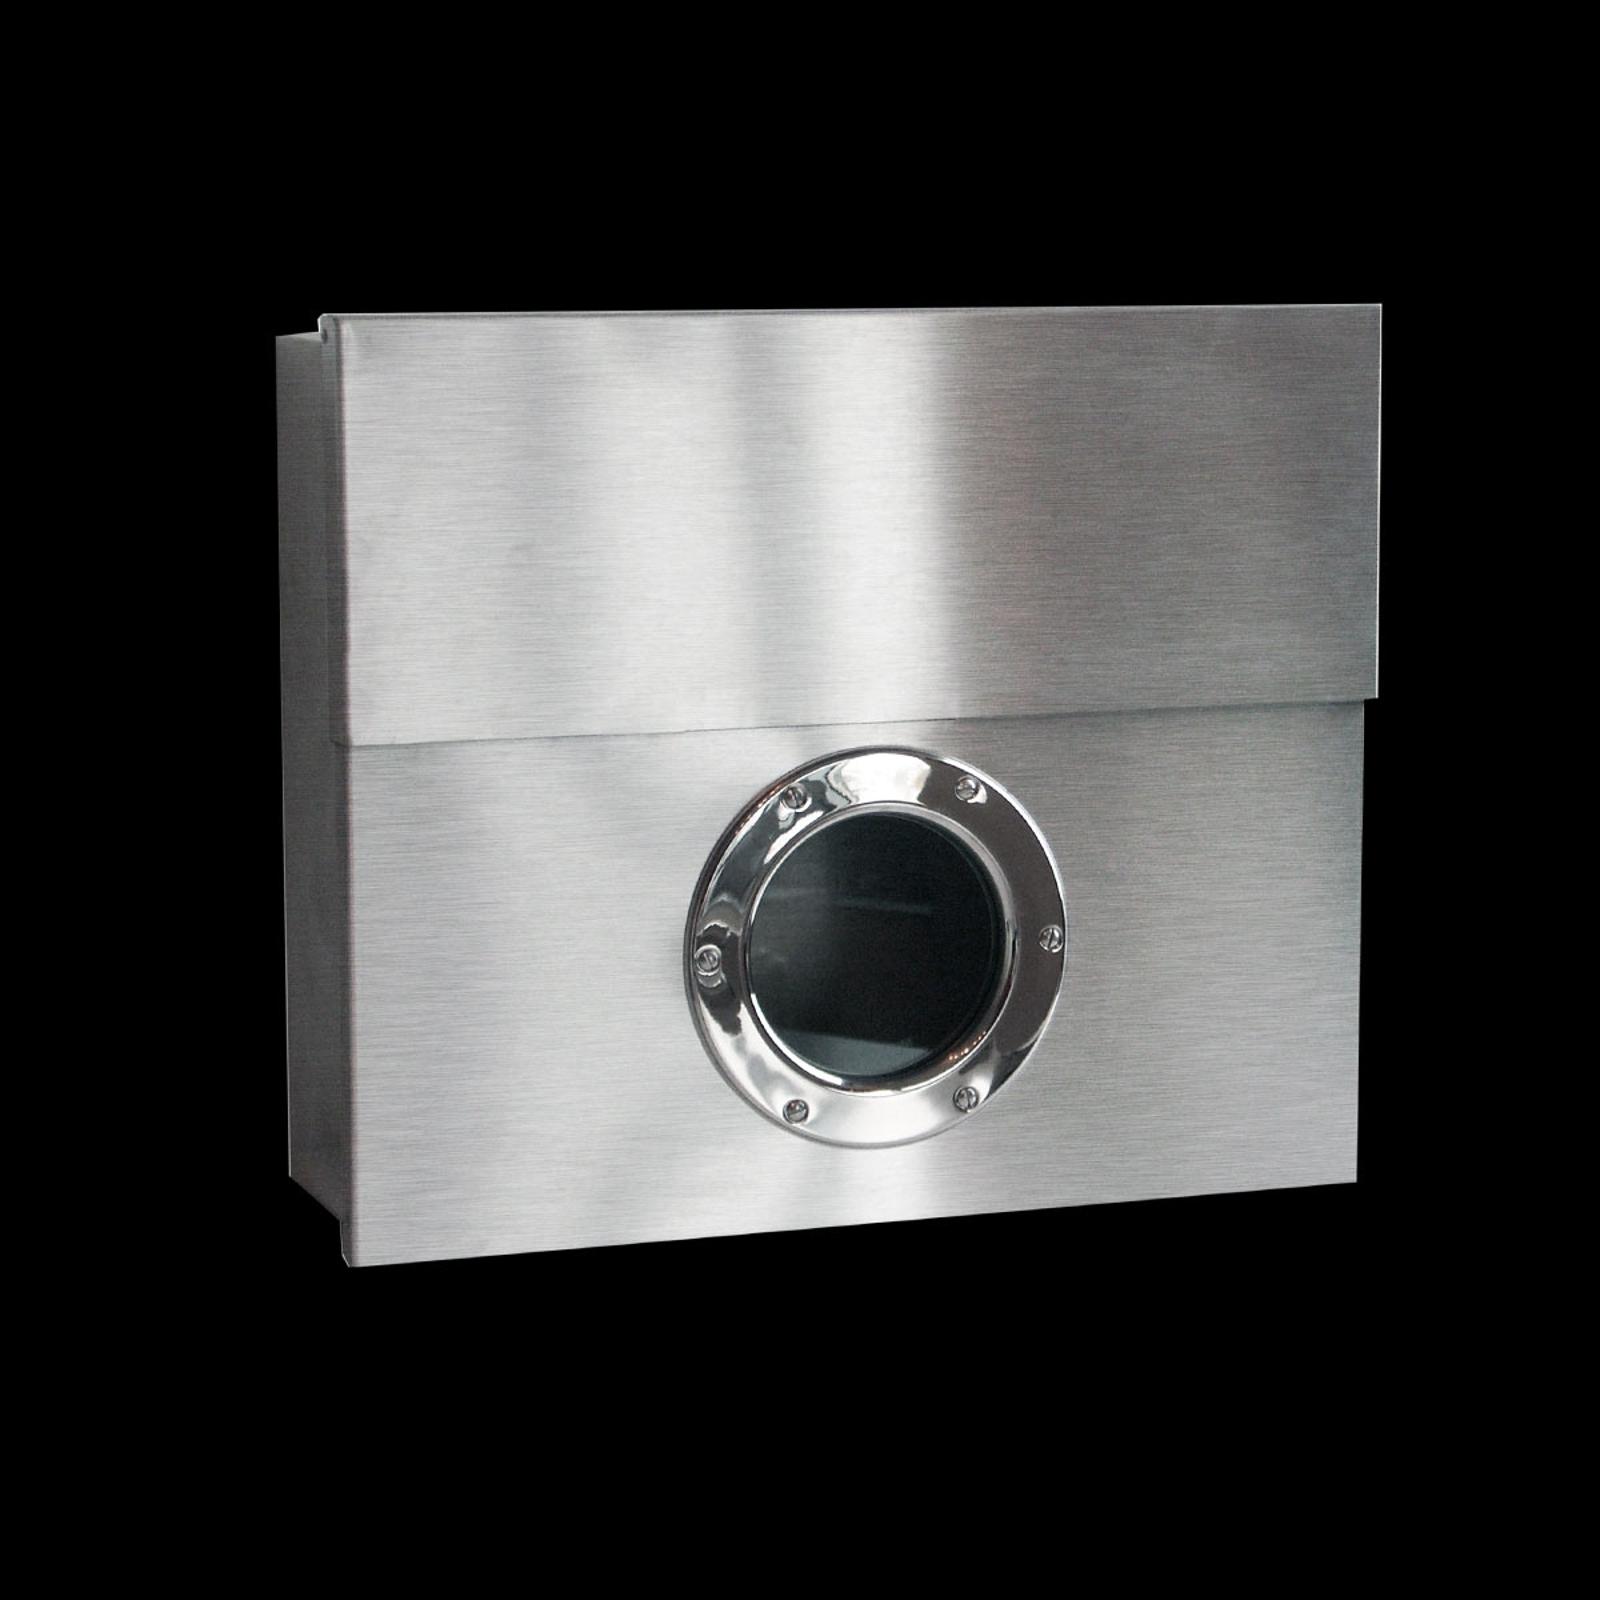 Letterman XXL stainless steel letterbox_1057053_1